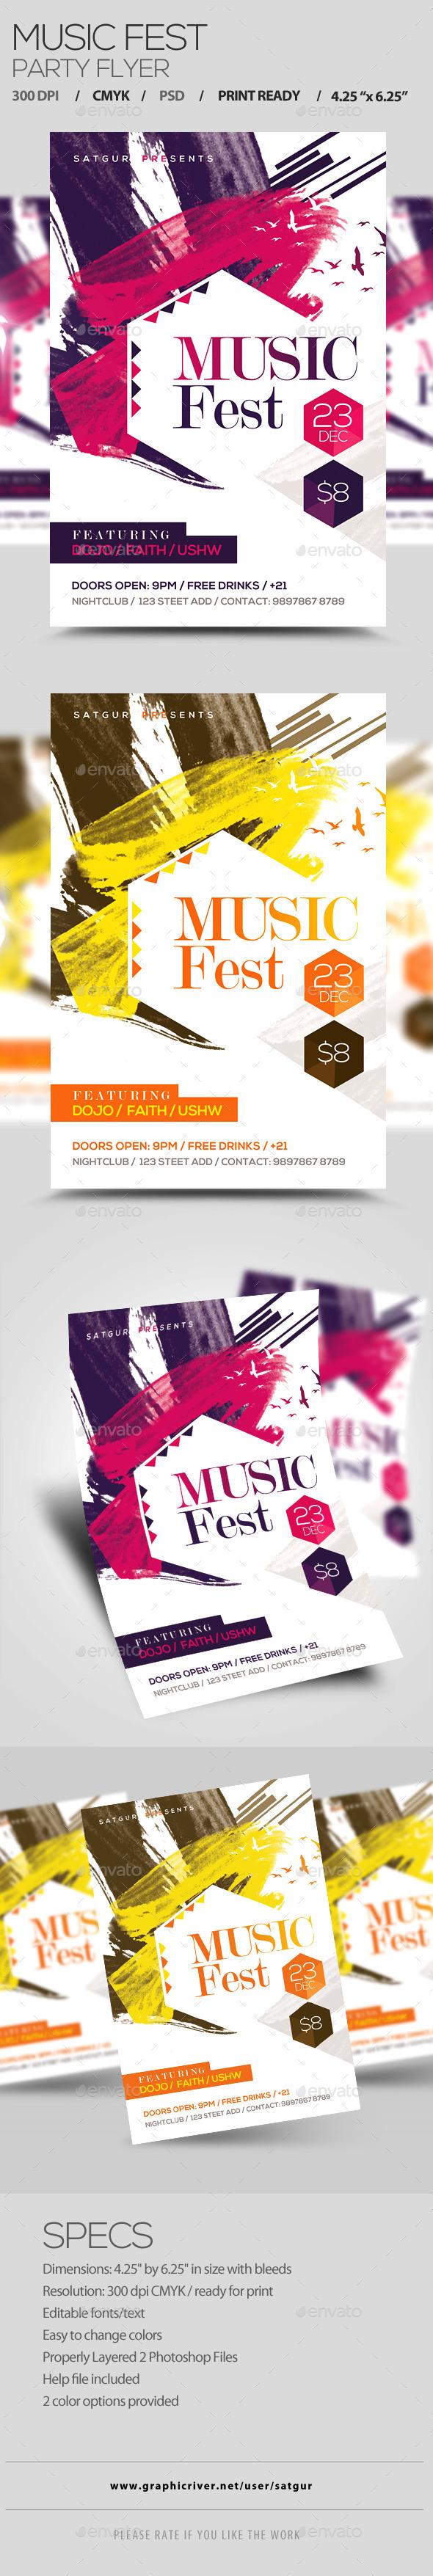 Music Fest Flyer - Clubs & Parties Events